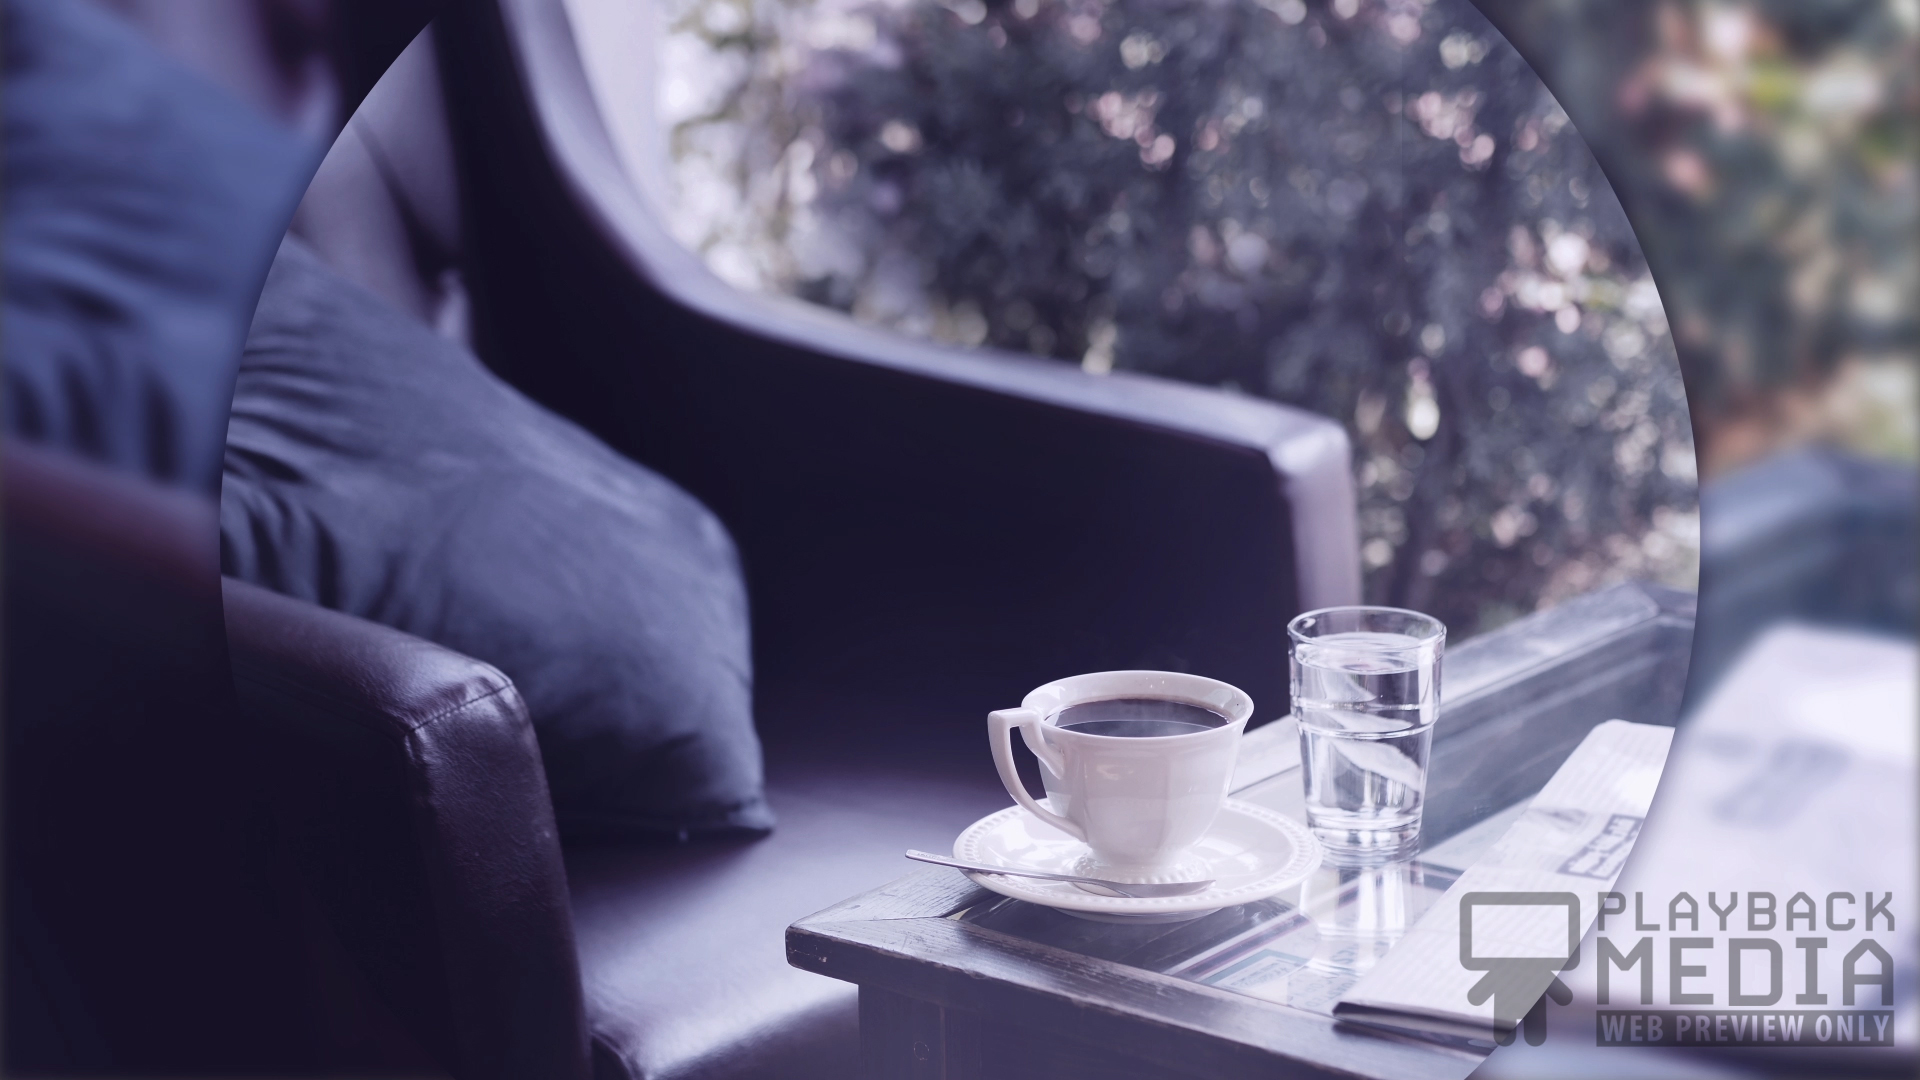 Coffee Break 1 Motion Background Image